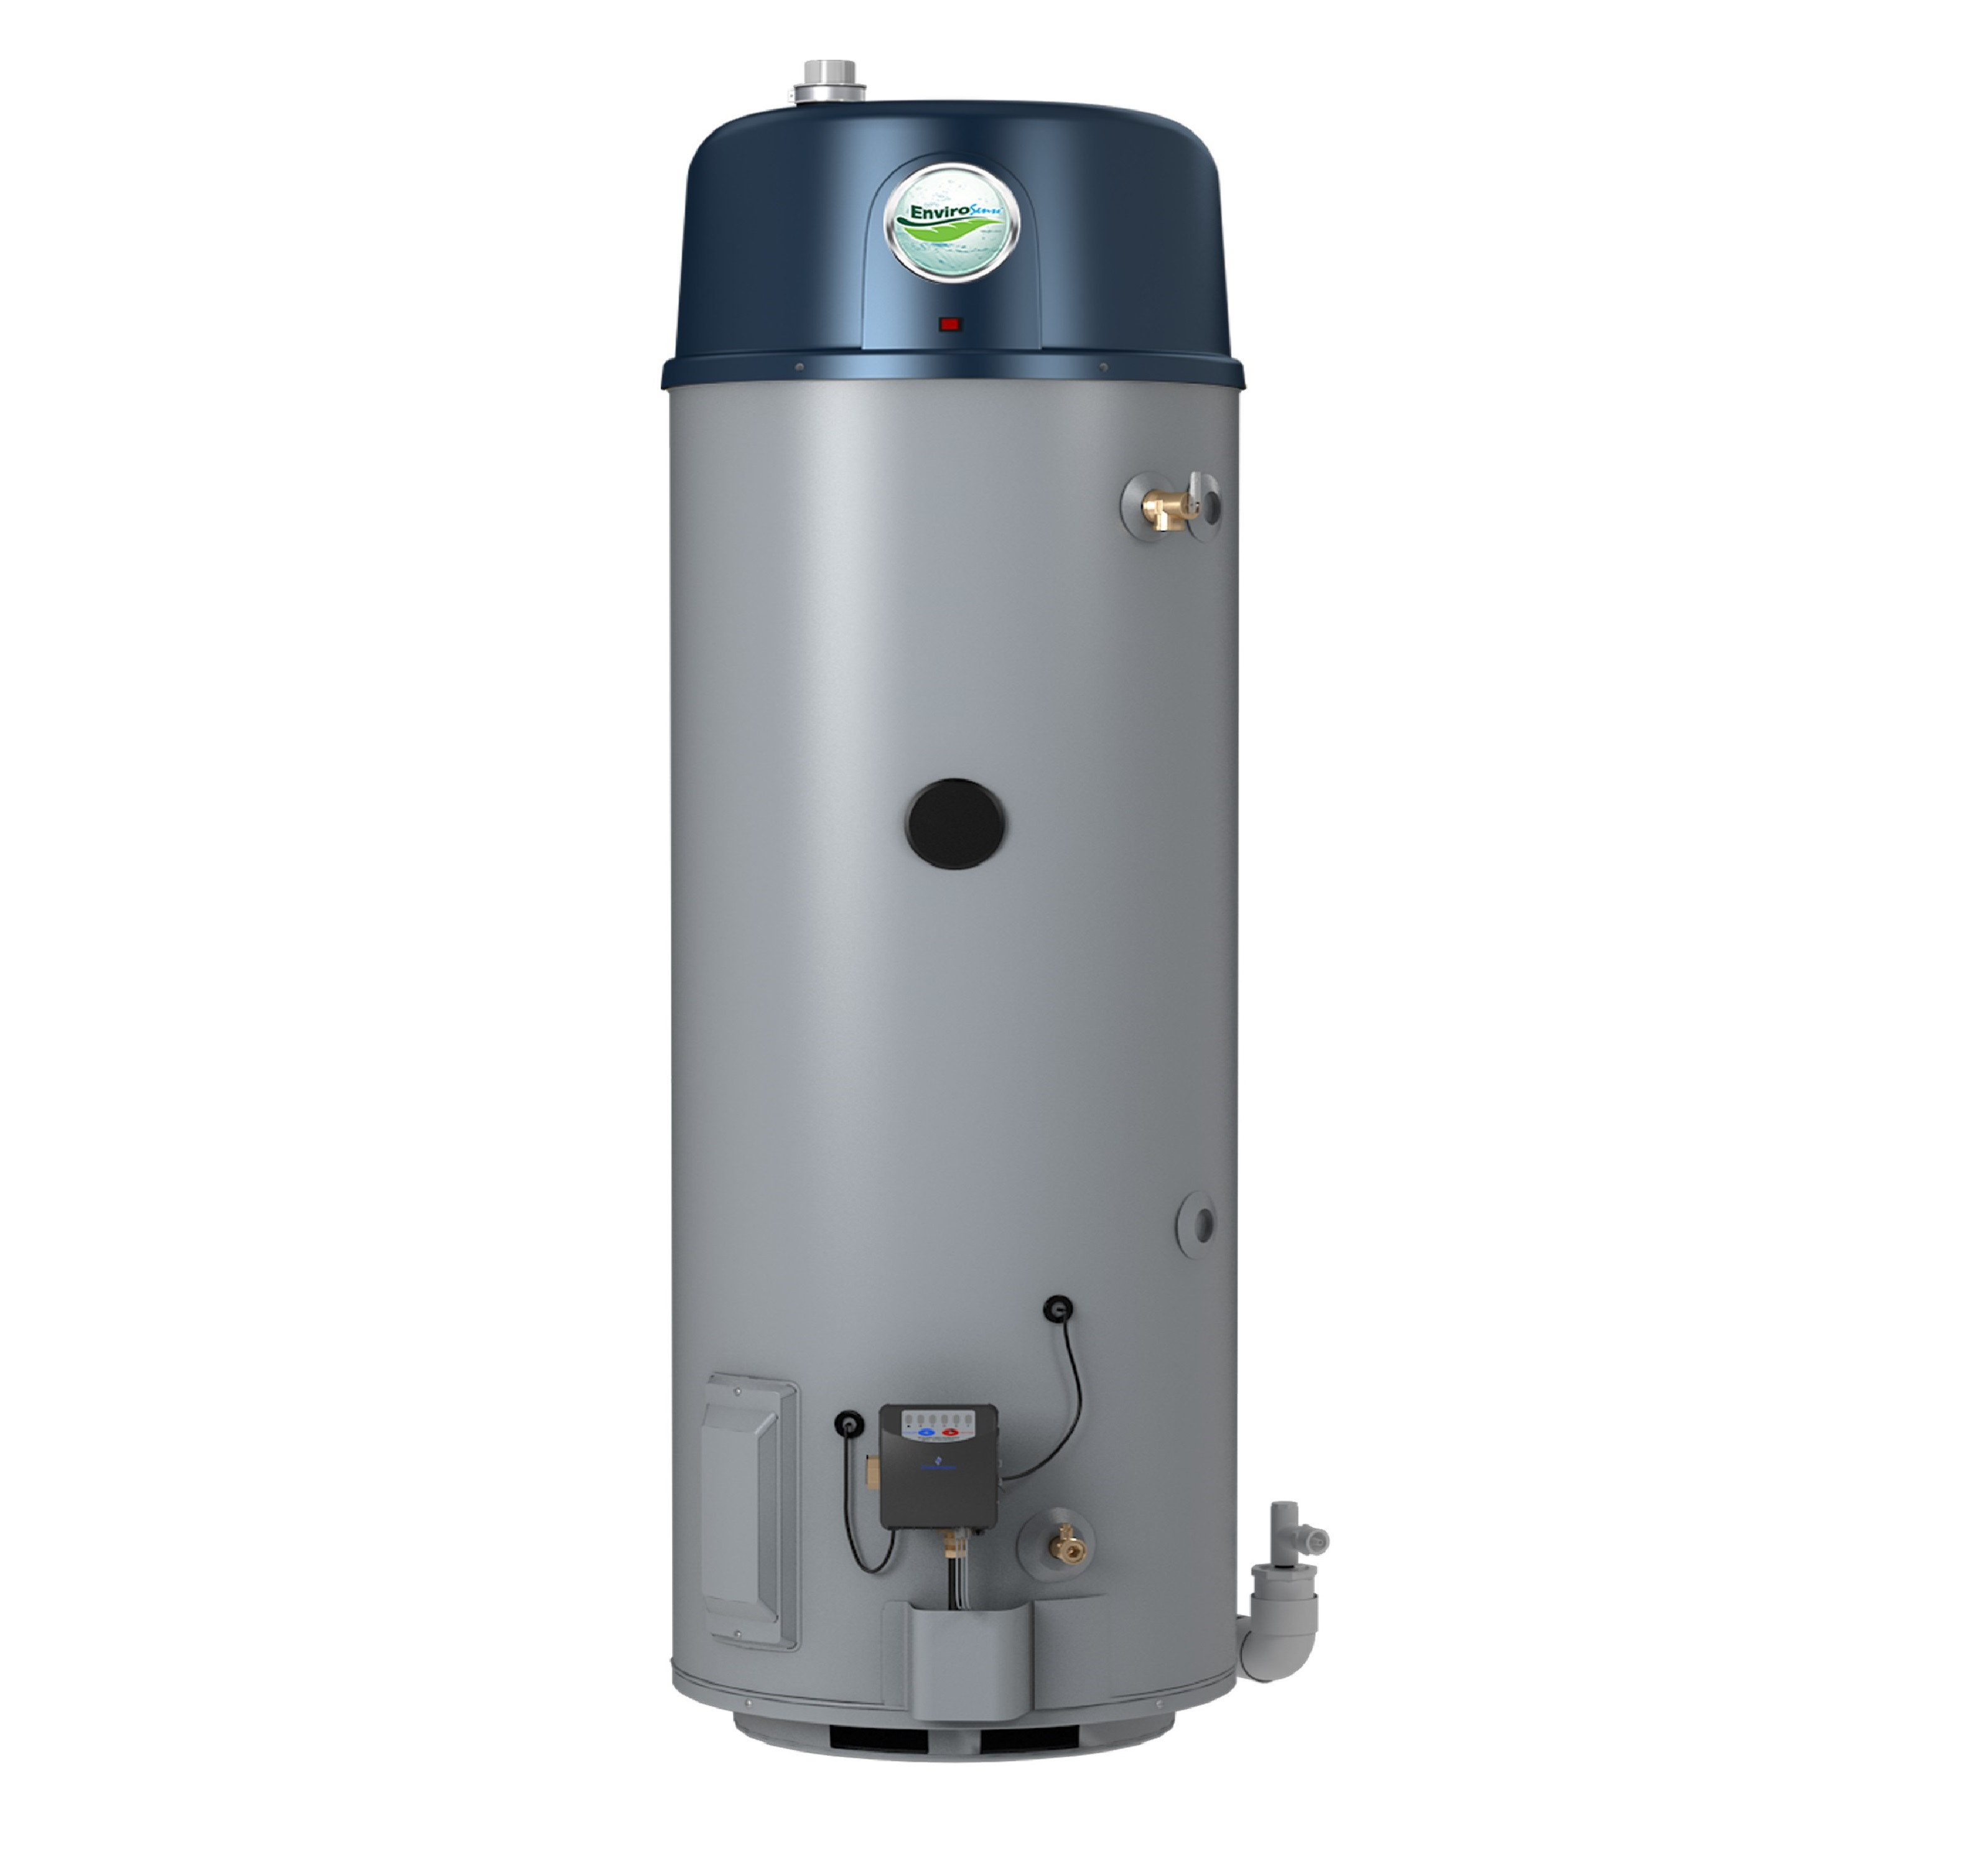 Gas Powered Ventilator : Envirosense power vent gas water heater em air systems inc